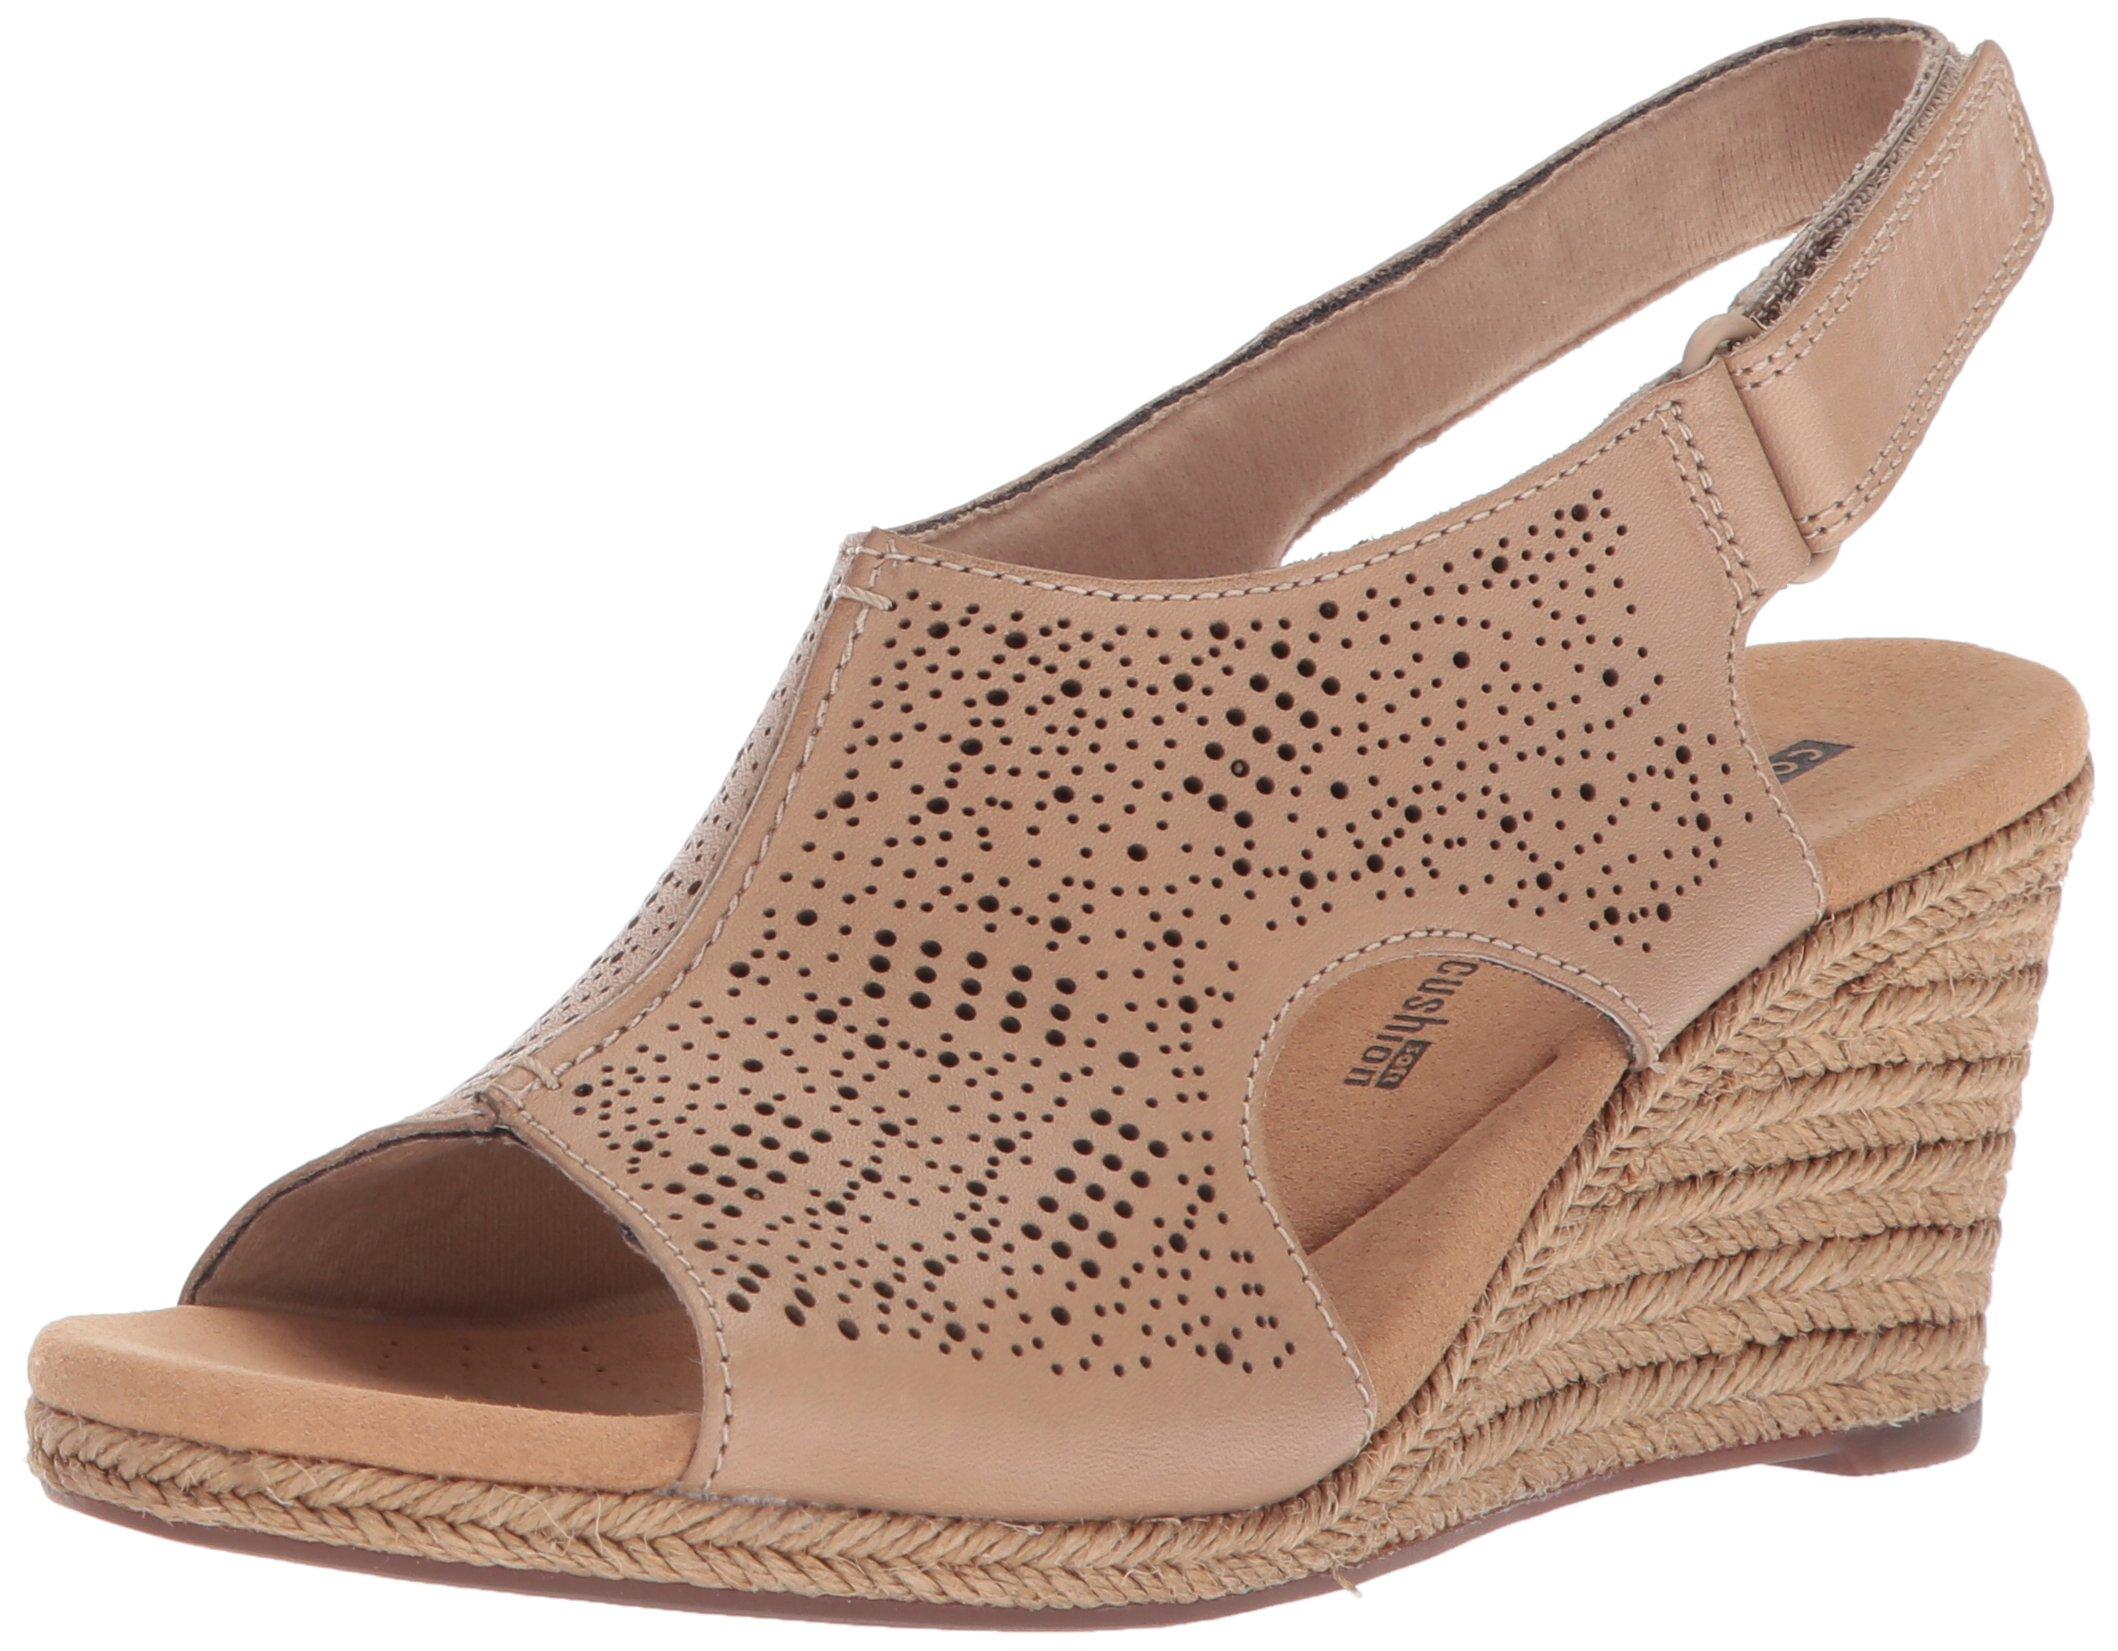 CLARKS Women's Lafley Rosen Platform Sand Leather 5.5 Medium US